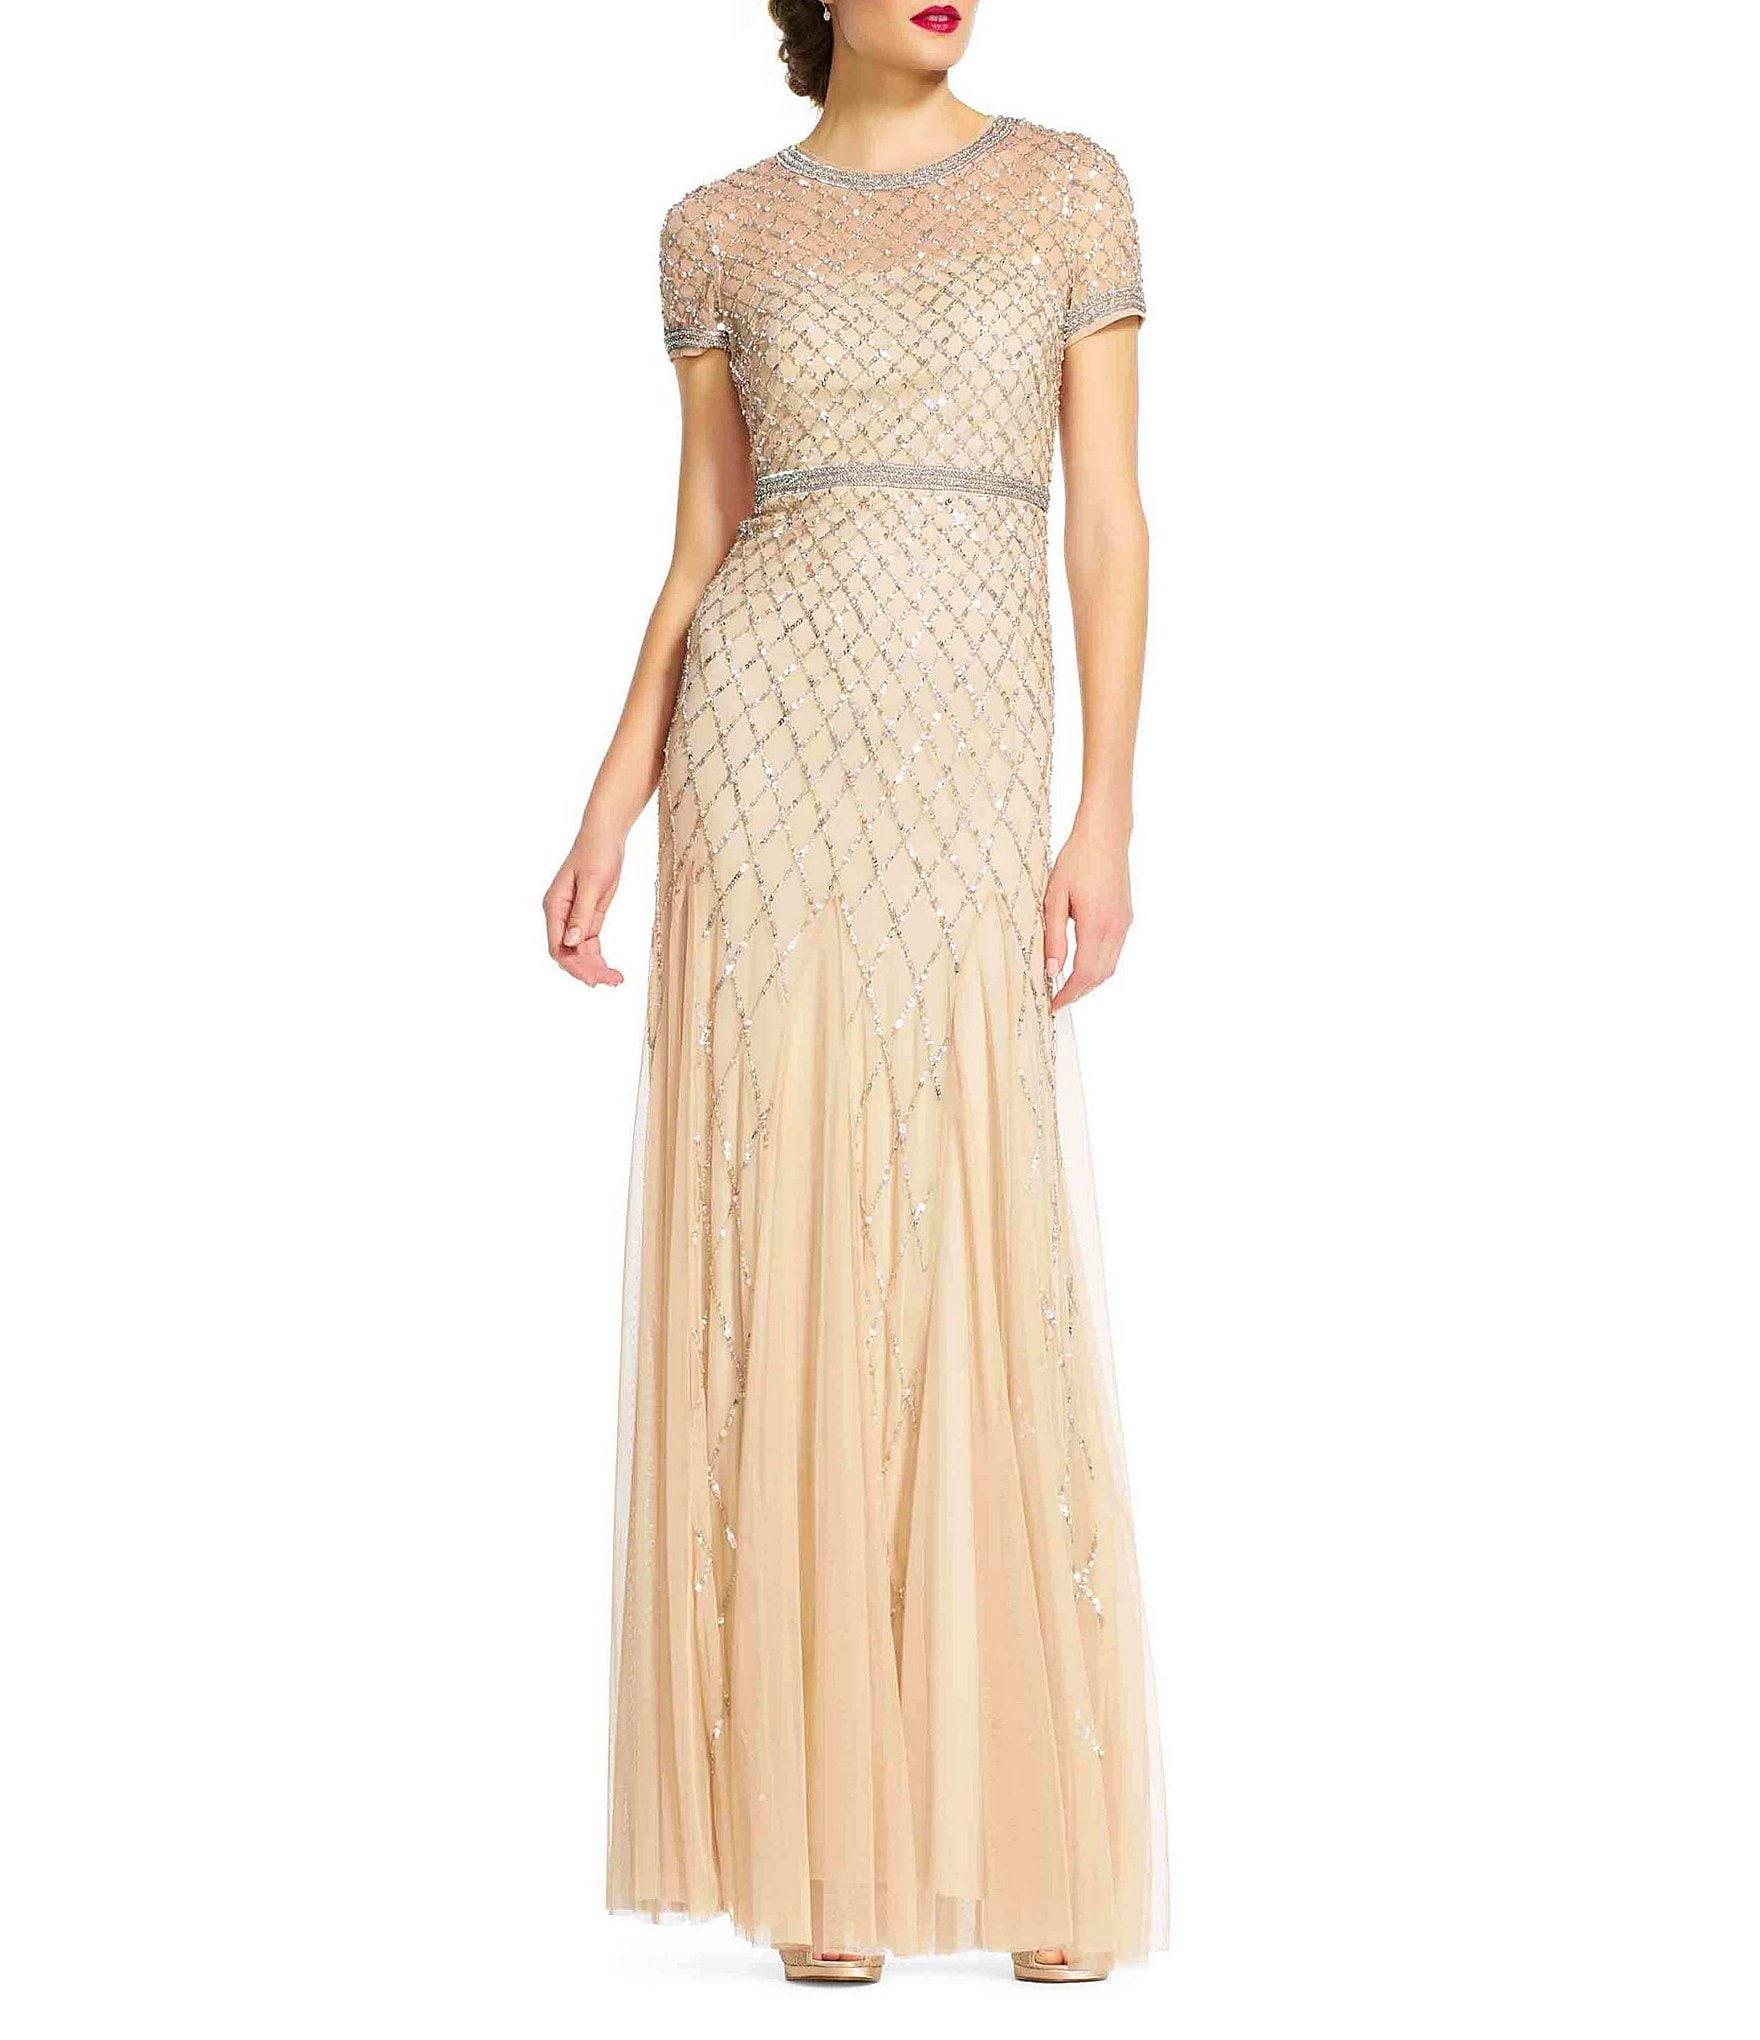 Adrianna Papell Beaded Short Sleeve Gown Dillards